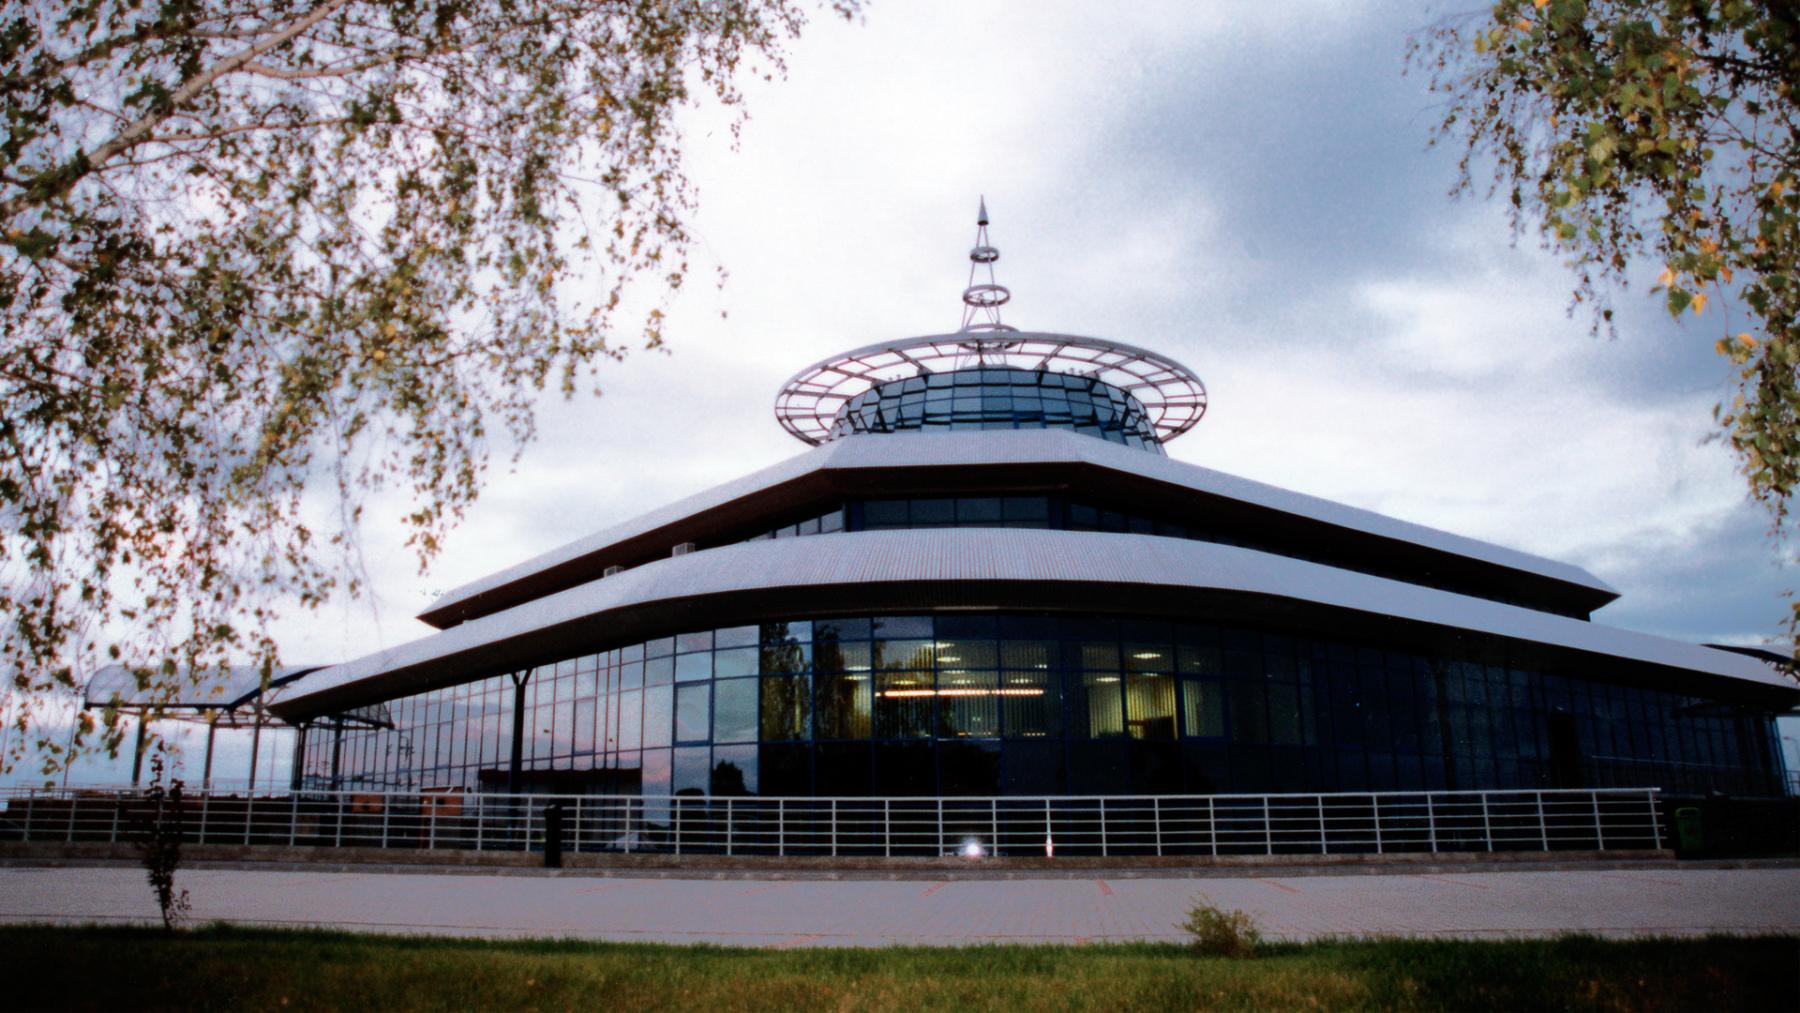 Cross-border Terminal Koroszczyn